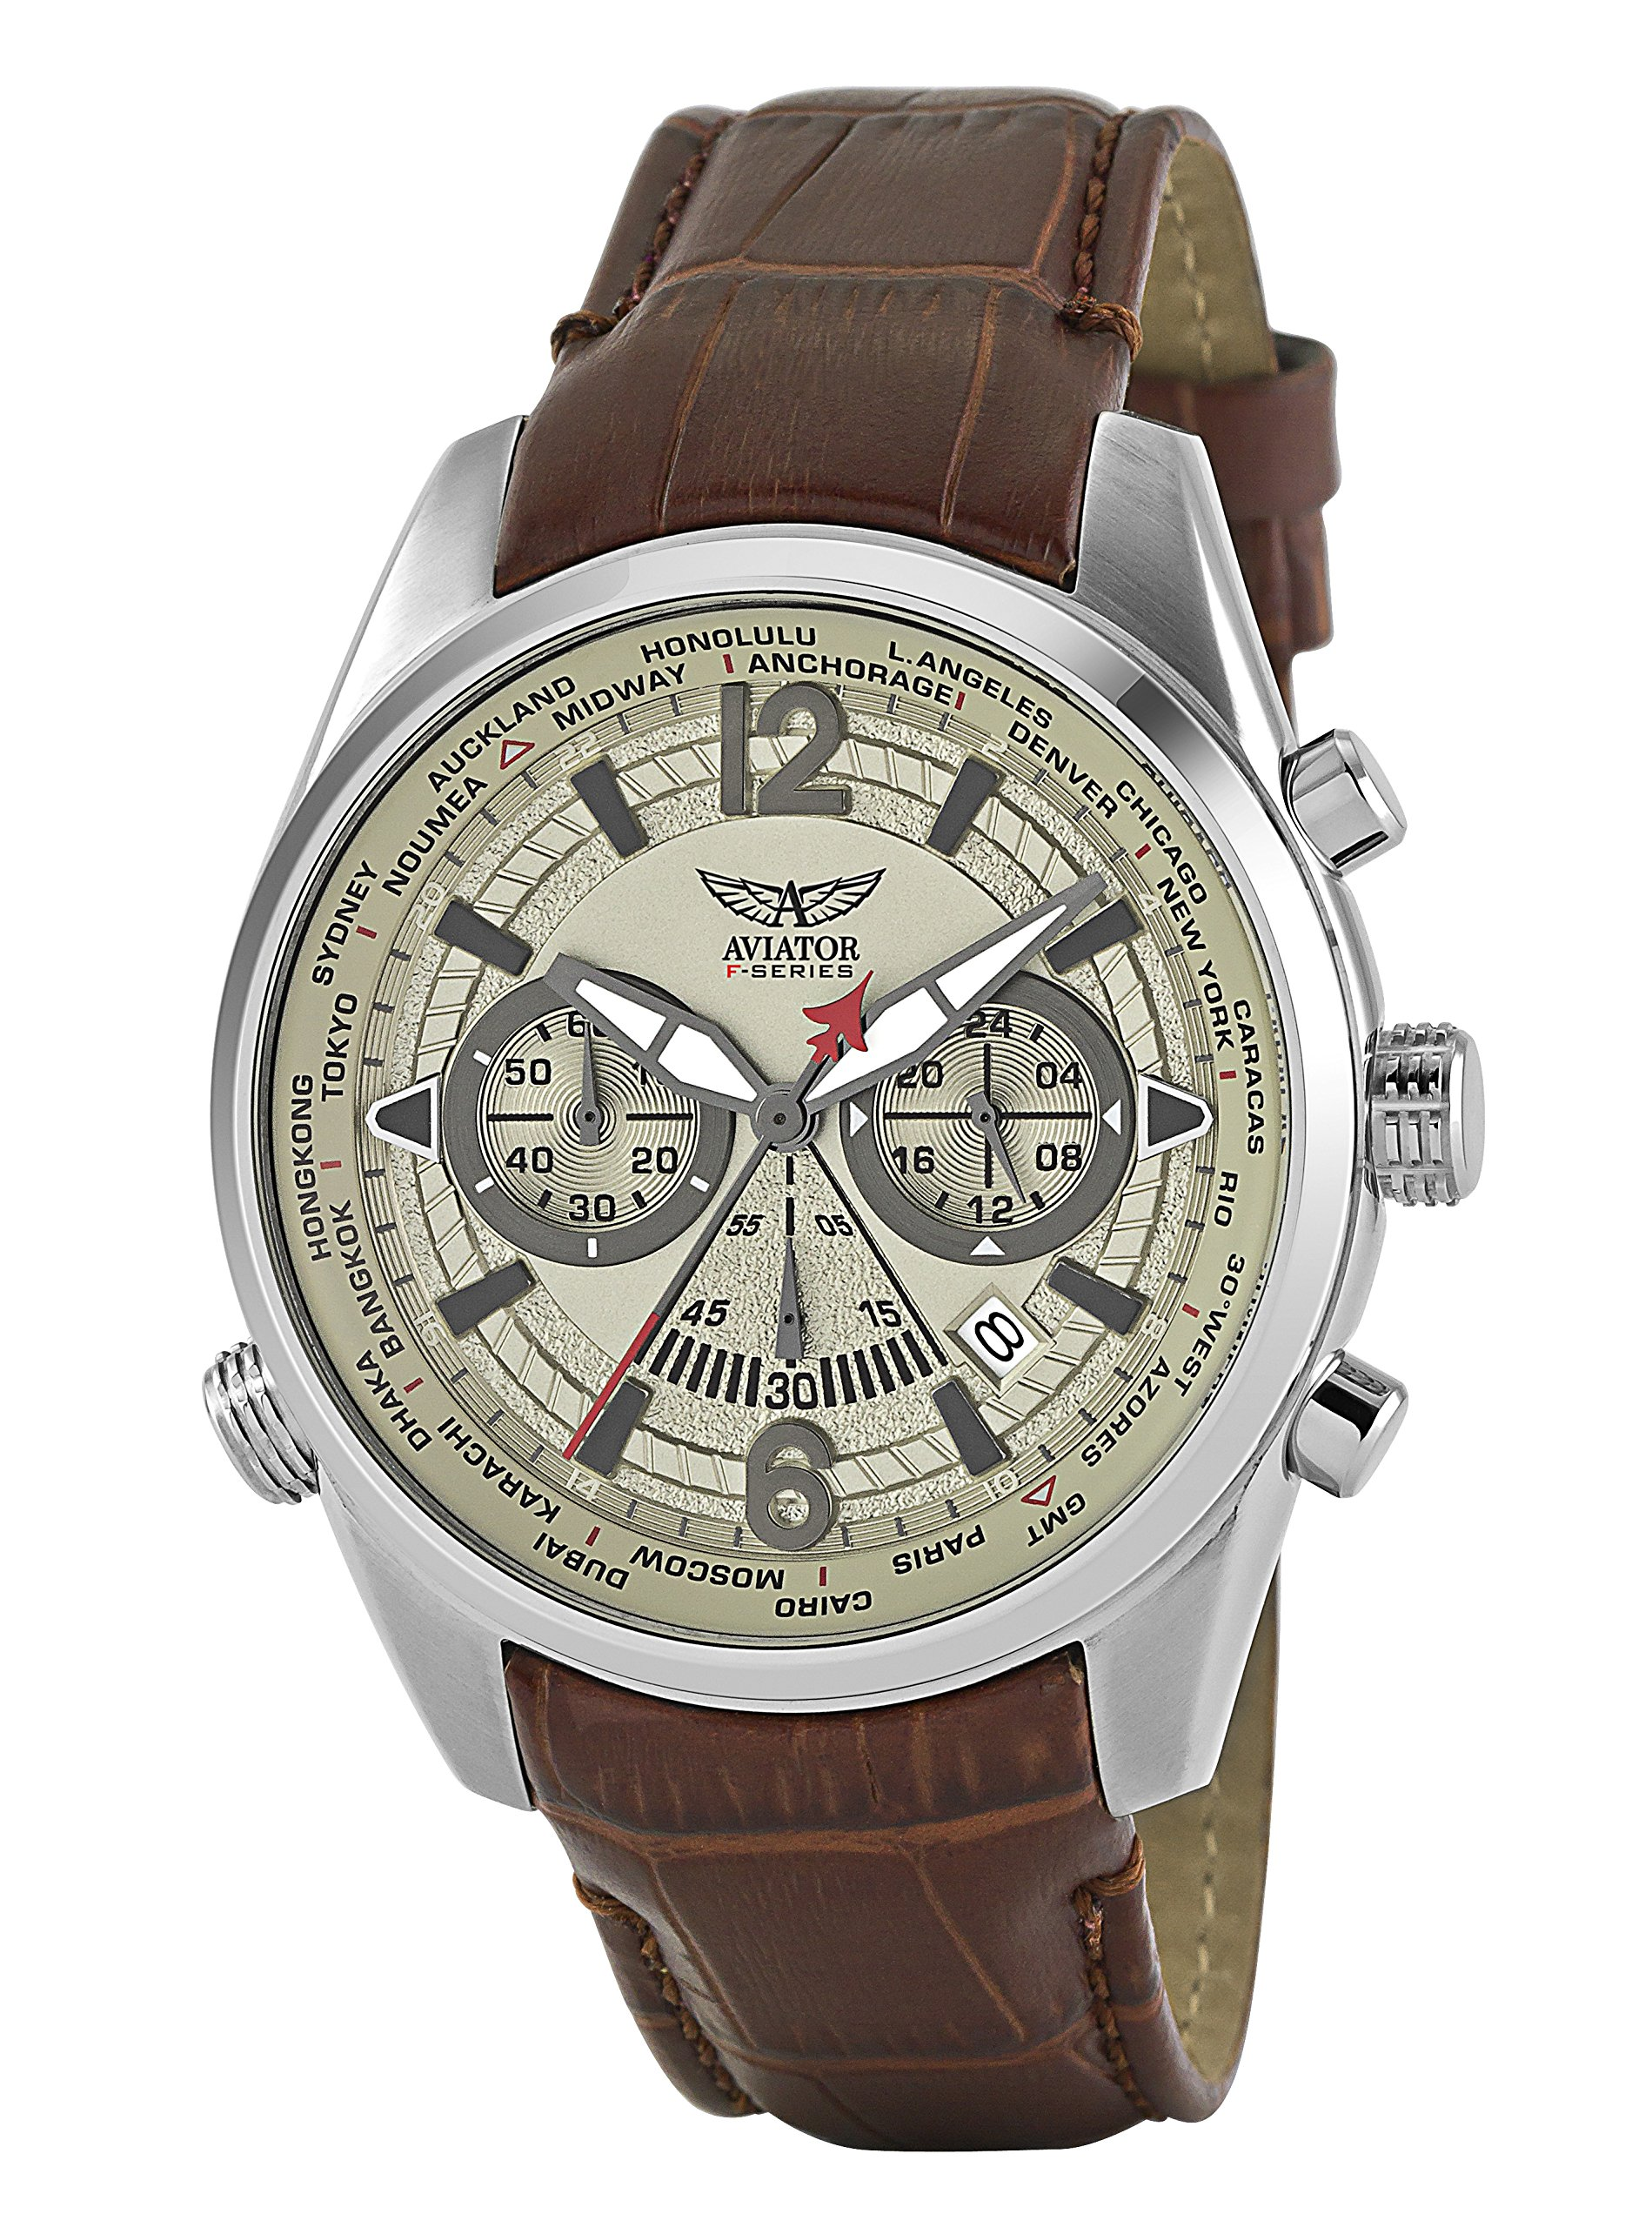 Aviators Watch by Aviator F-Series - Aviators Brown Strap Beige Dial and Luminous Indices - Pilot Quartz Chronograph AVW2120G318